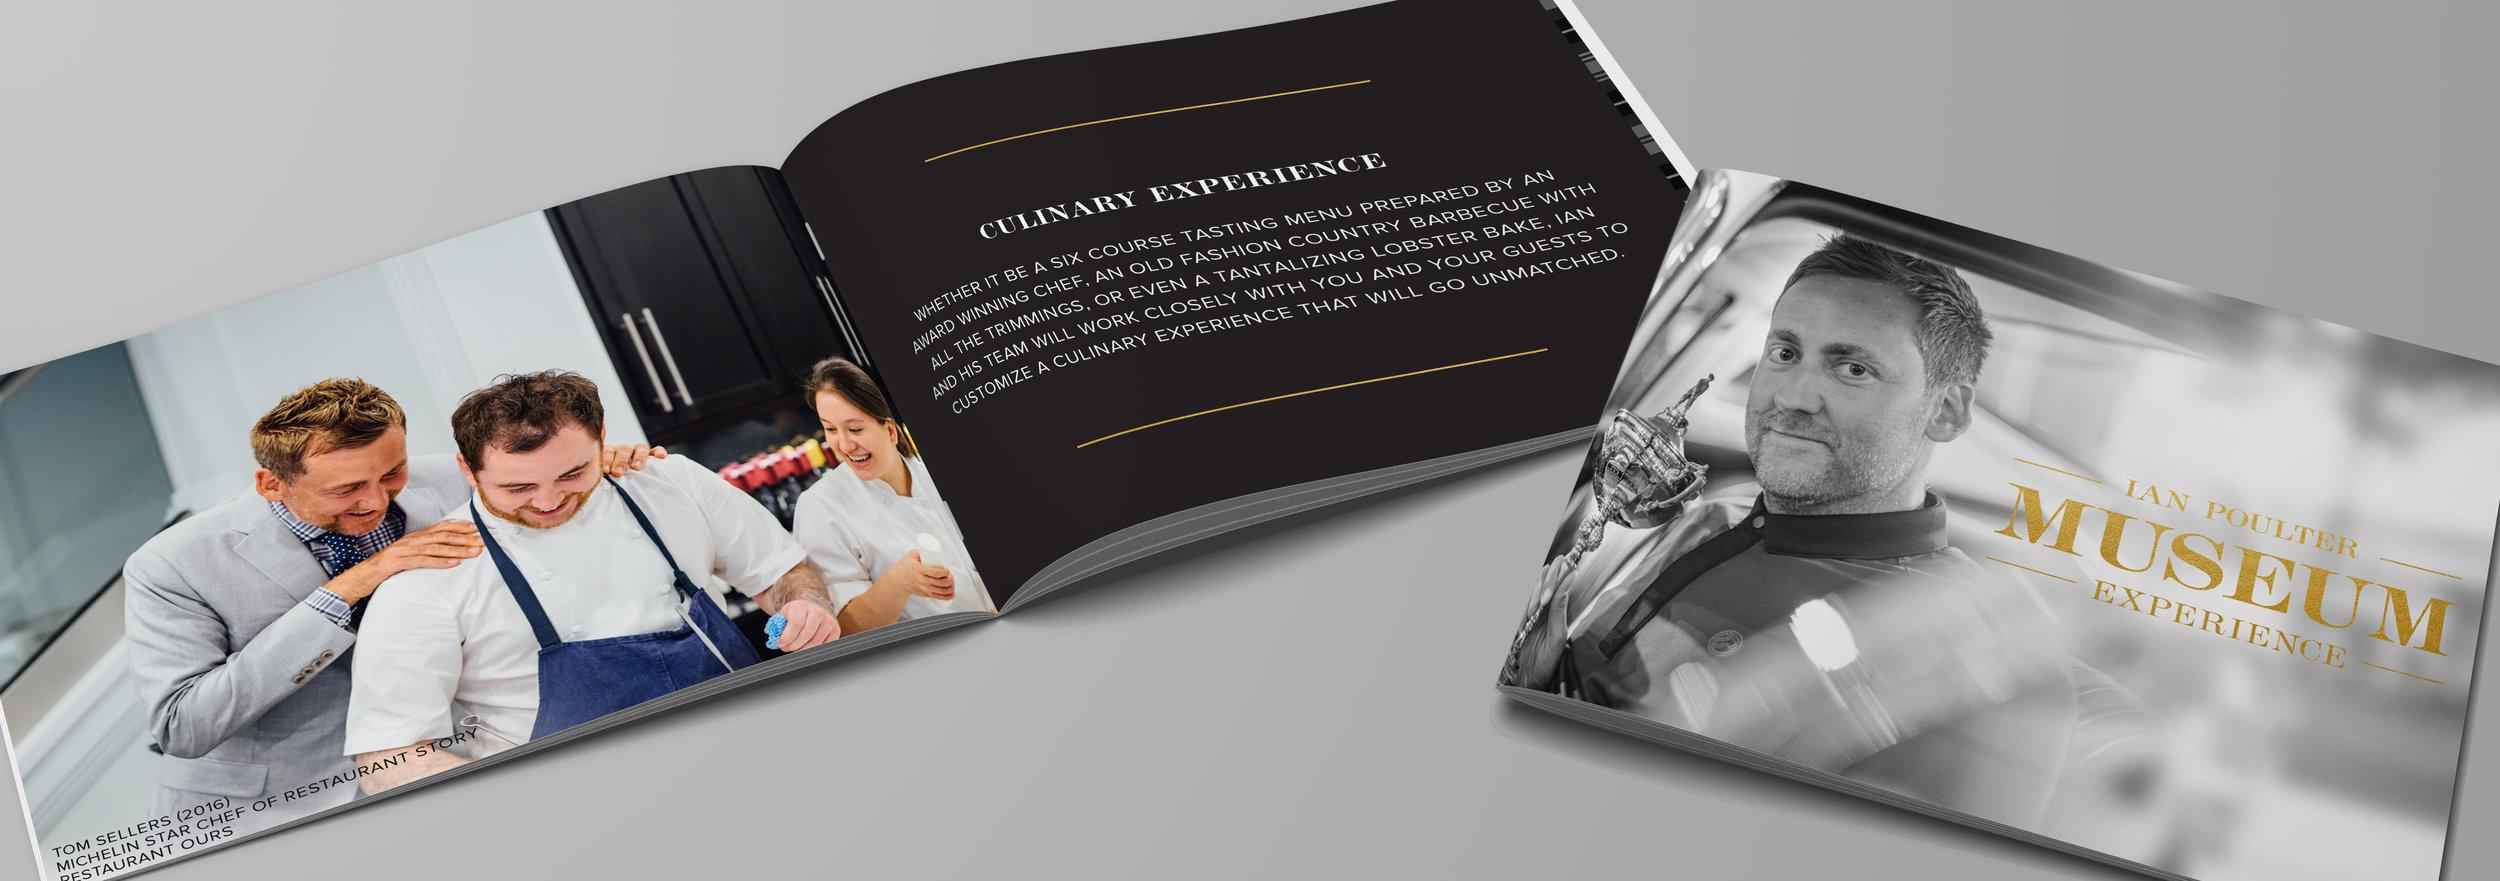 MuseumExperience_Booklet_Spread.jpg